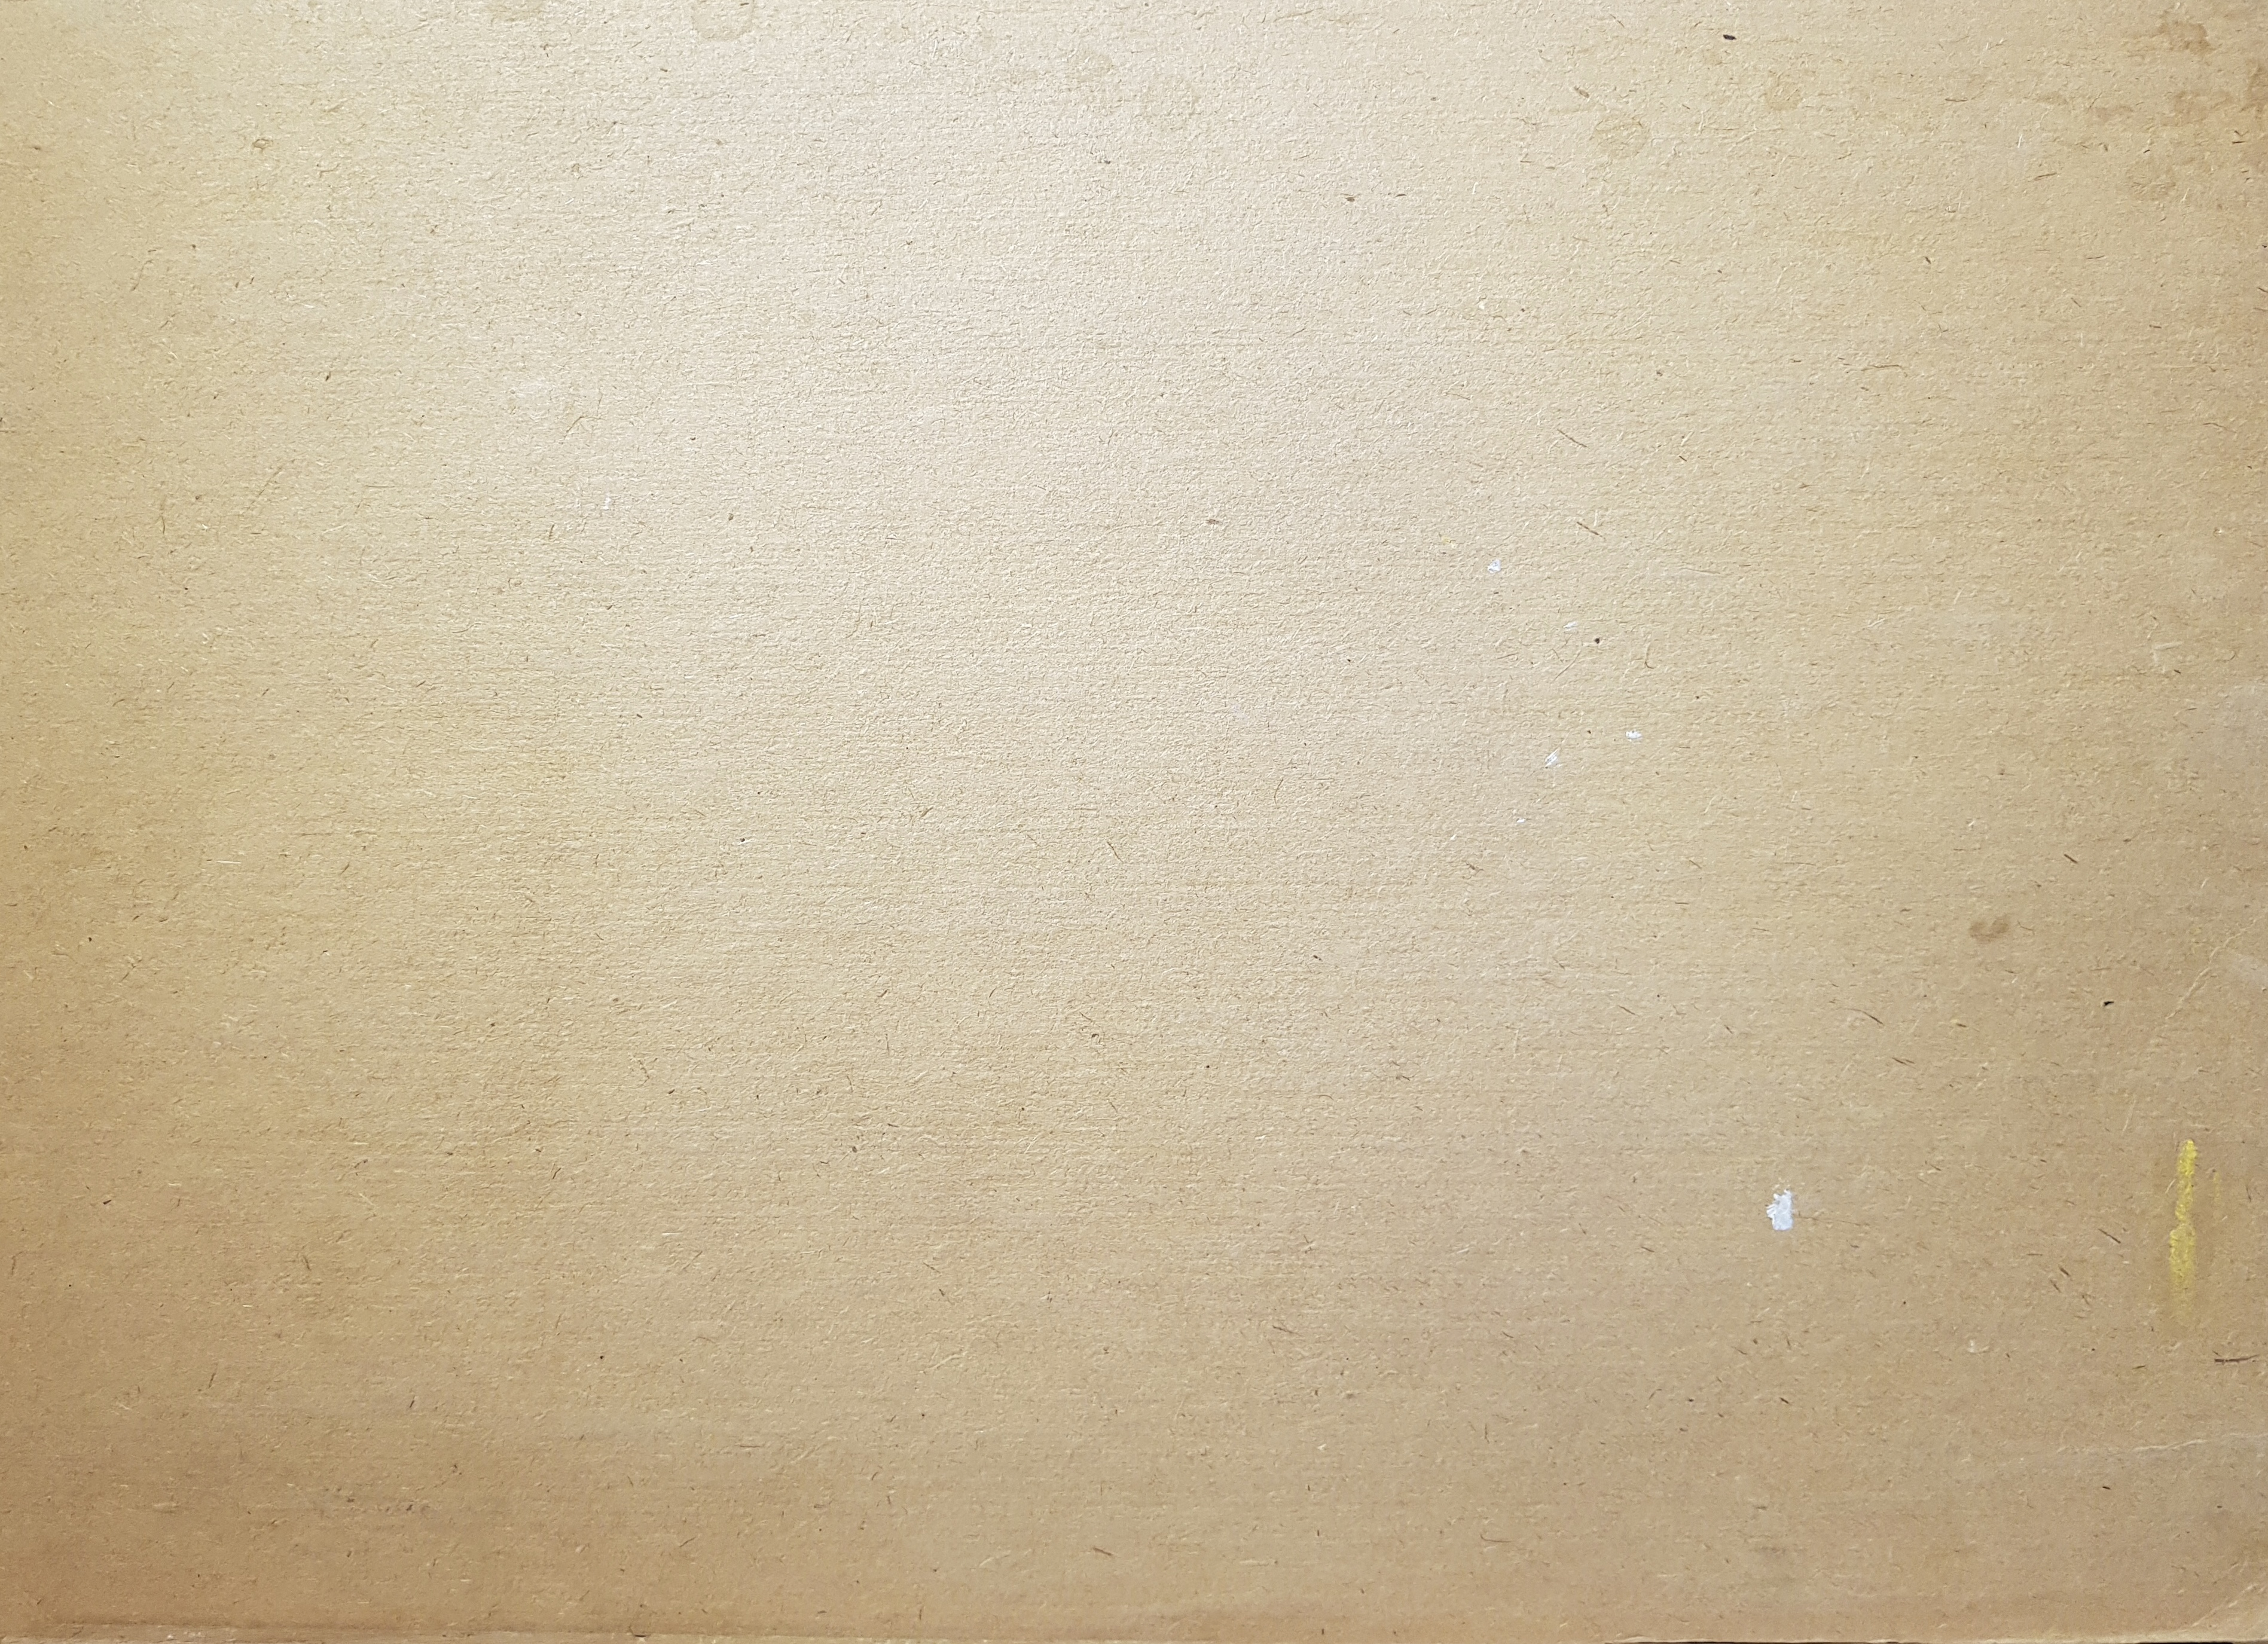 Оборот. Дехтерева Татьяна Александровна. Вид на красную площадь и Исакиевский собор